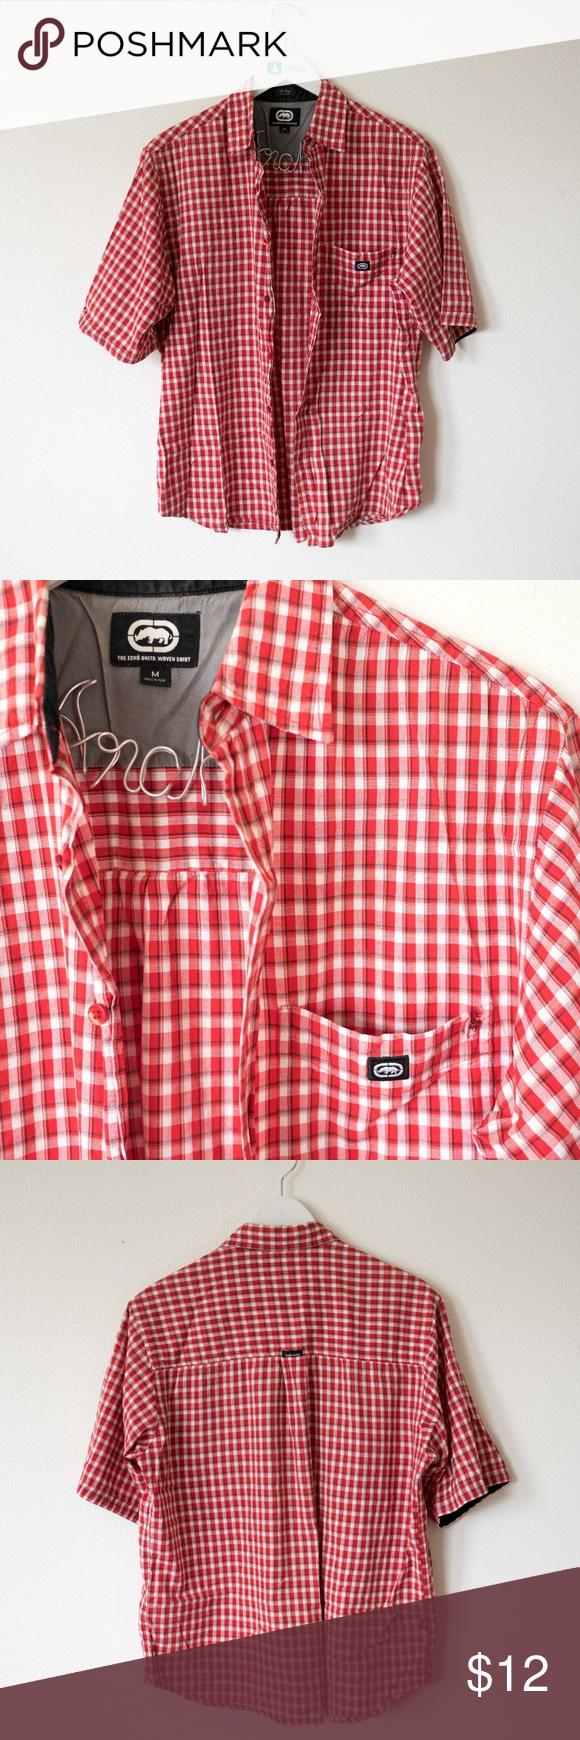 Casual pink dress shirt  MENS medium ecko unlimited plaid button up shirt  My Posh Closet